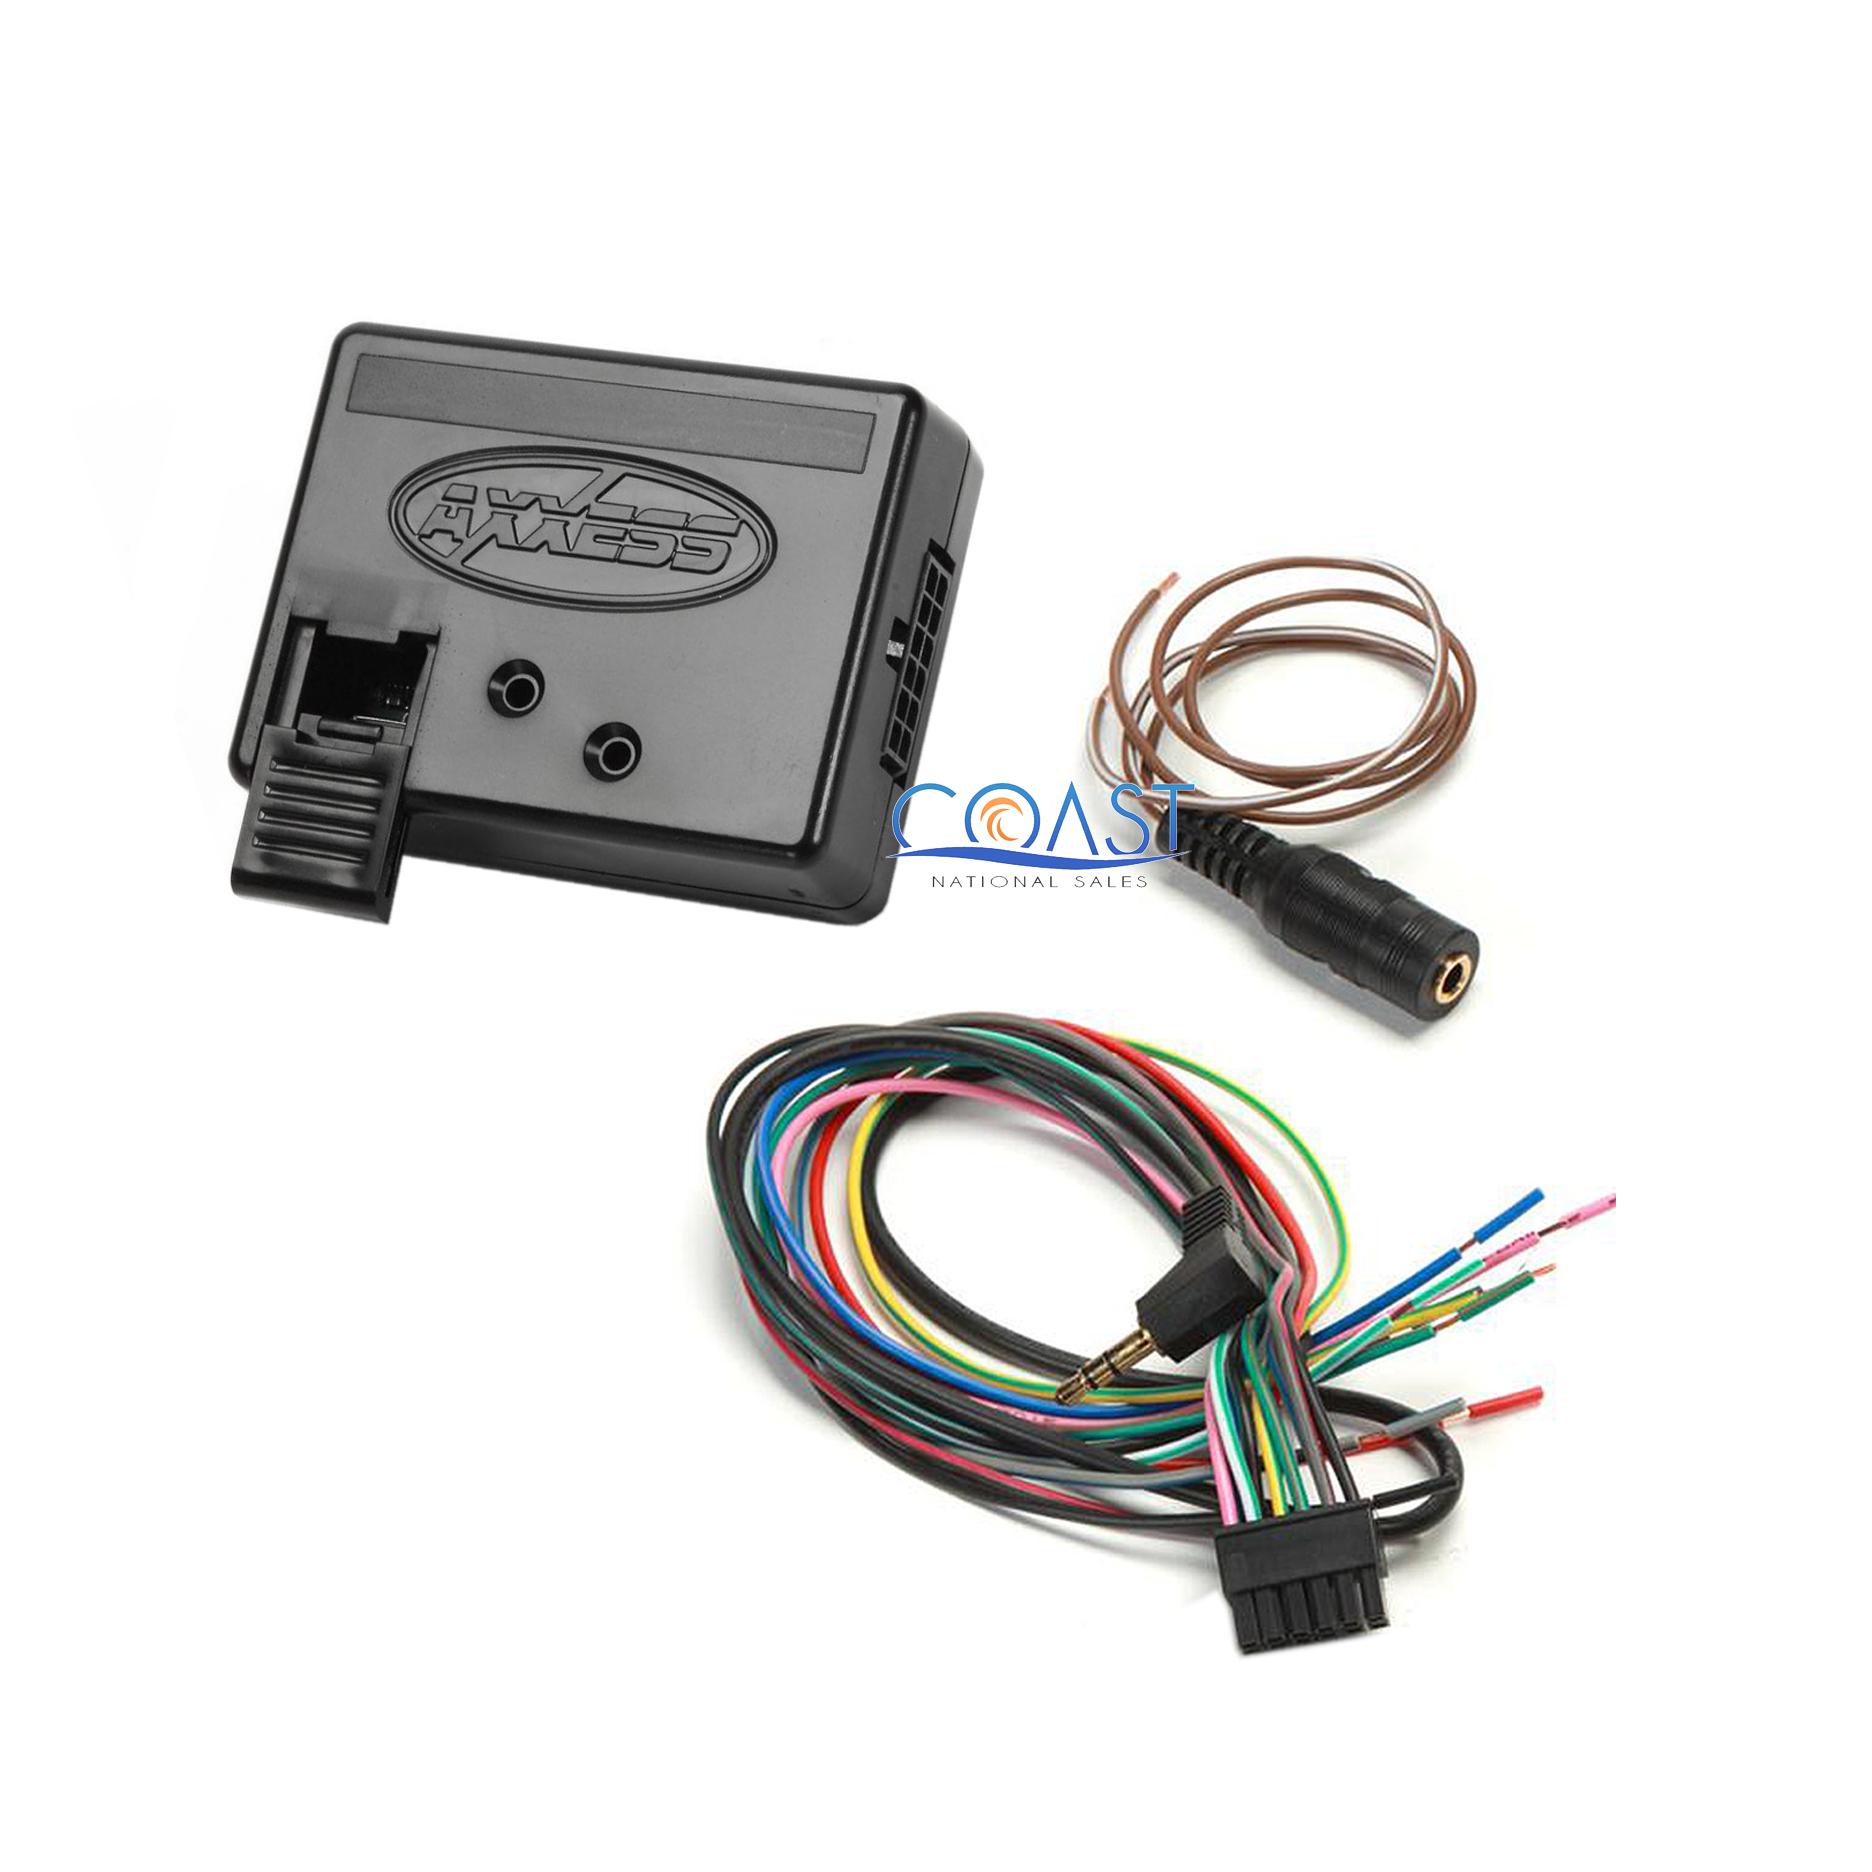 axxess aswc 1 steering wheel control adapter instructions